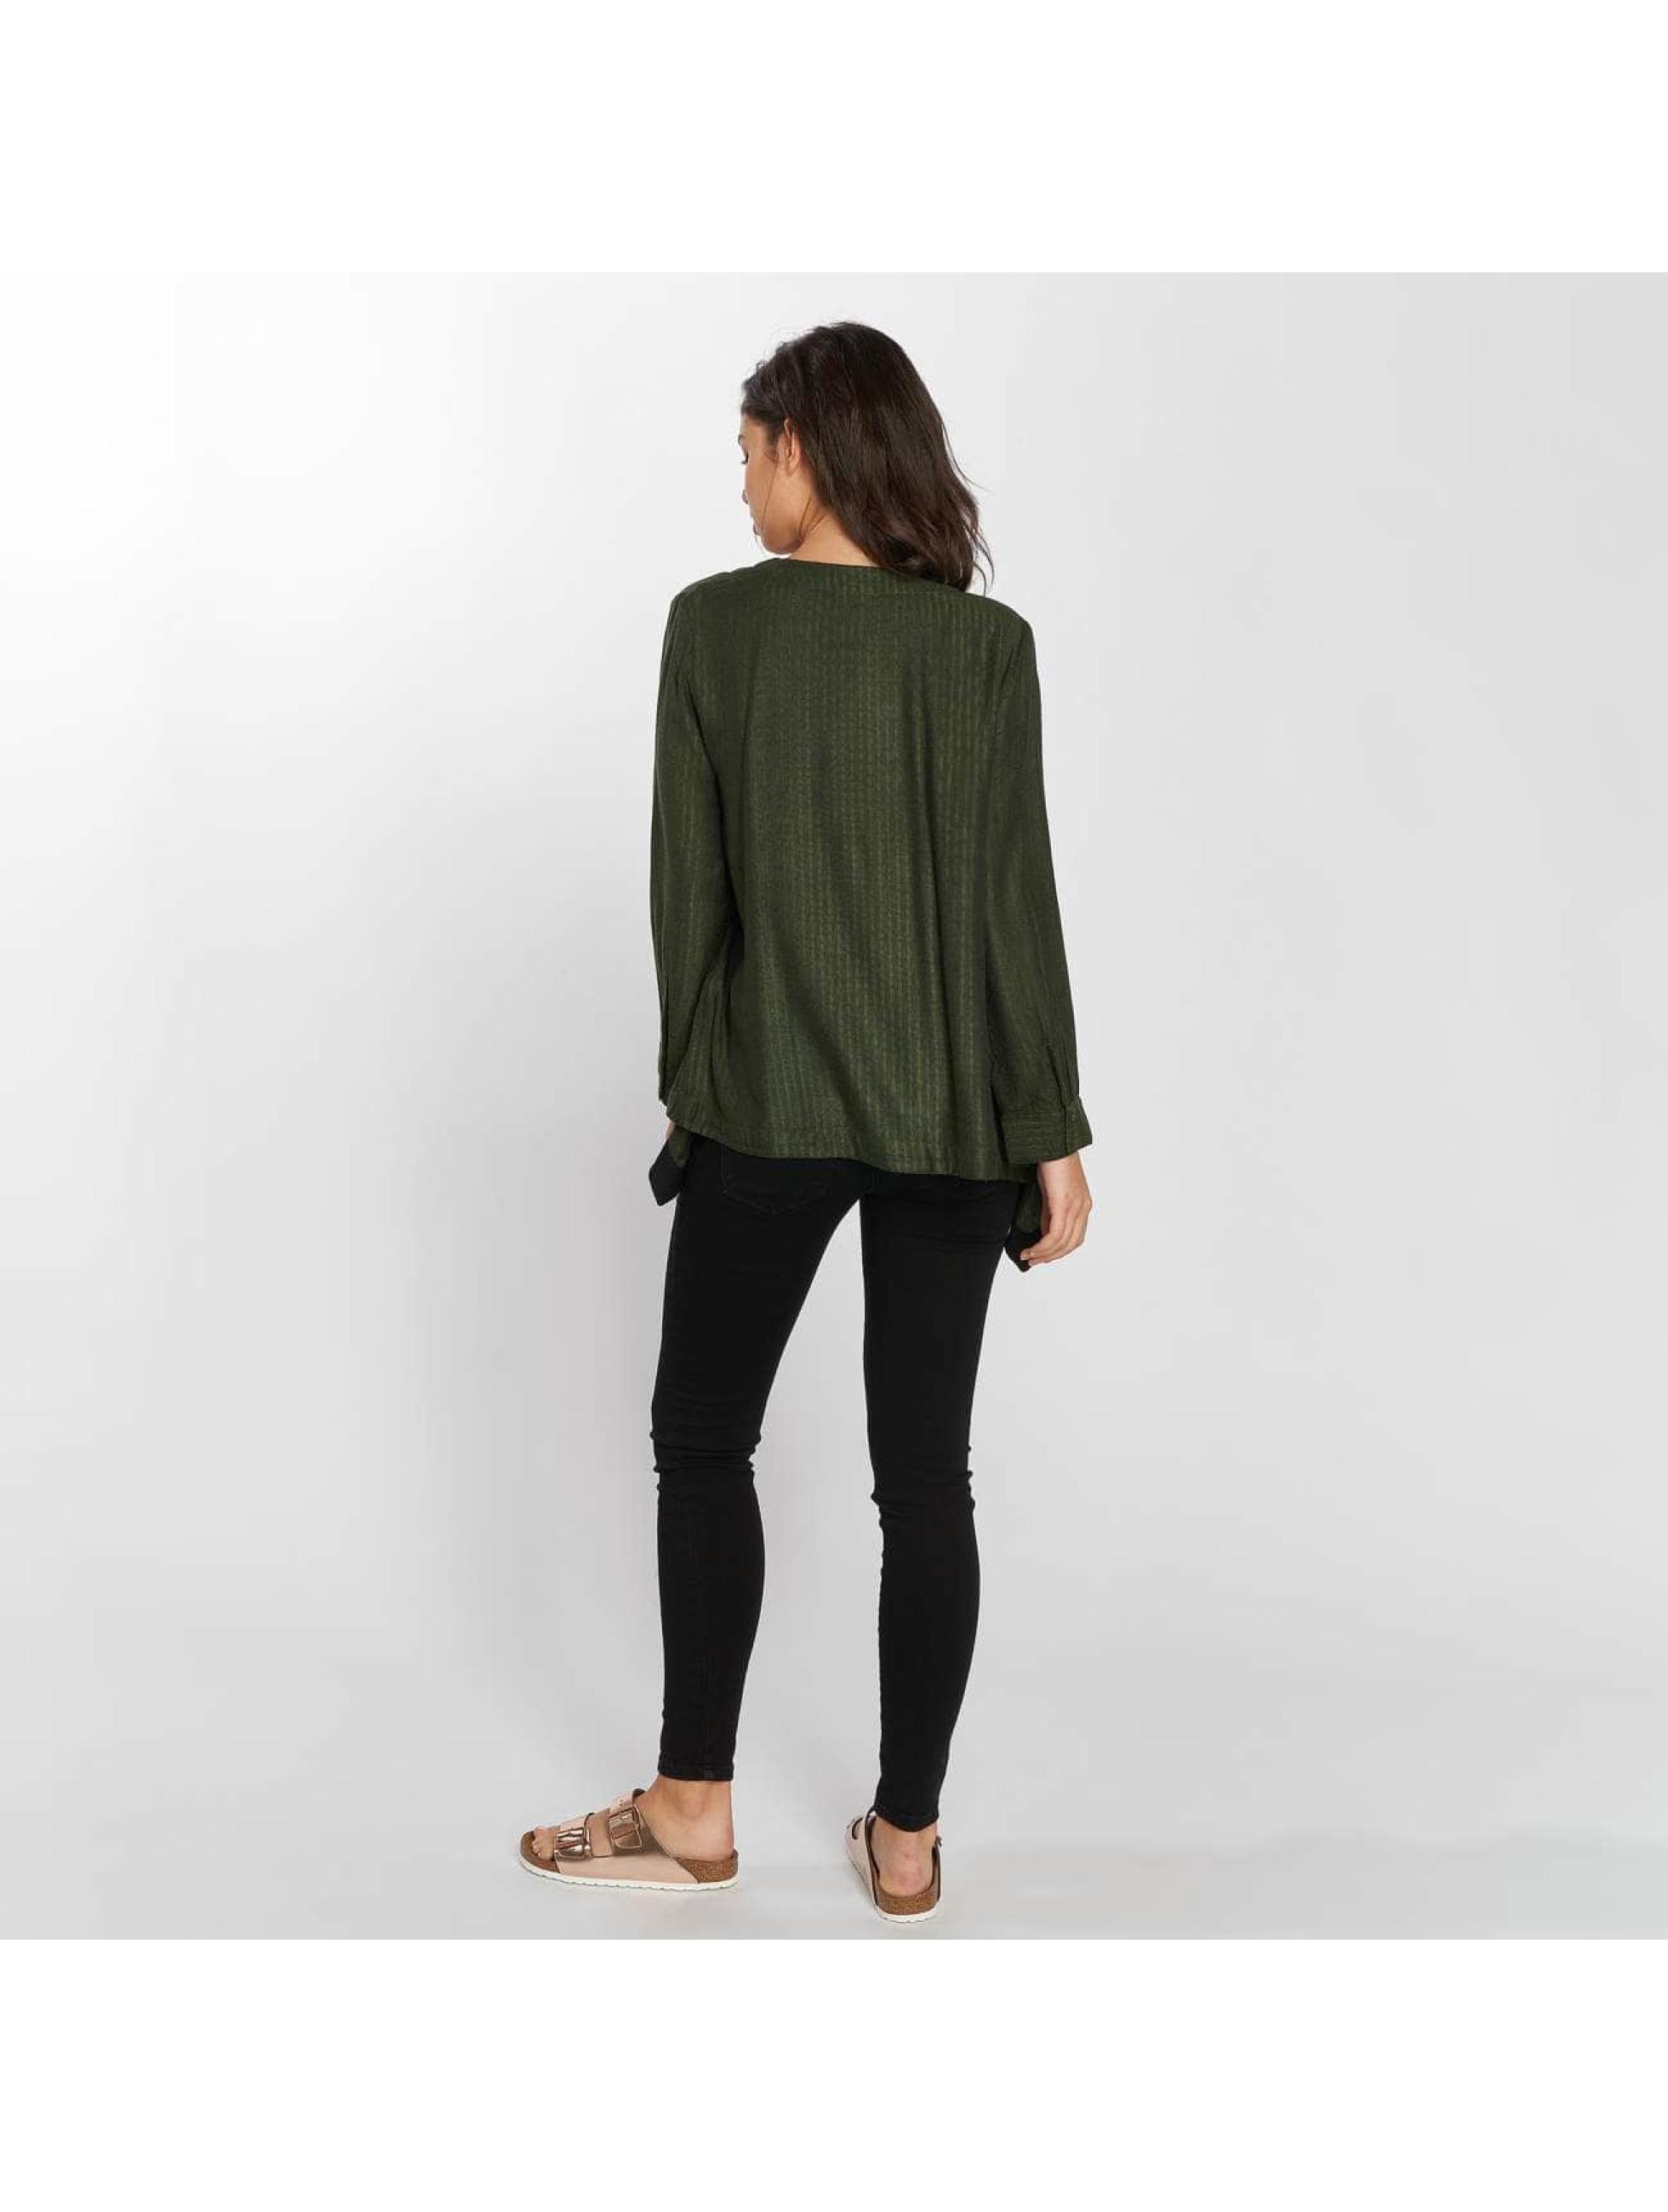 Vero Moda Кардиган vmMichelle зеленый